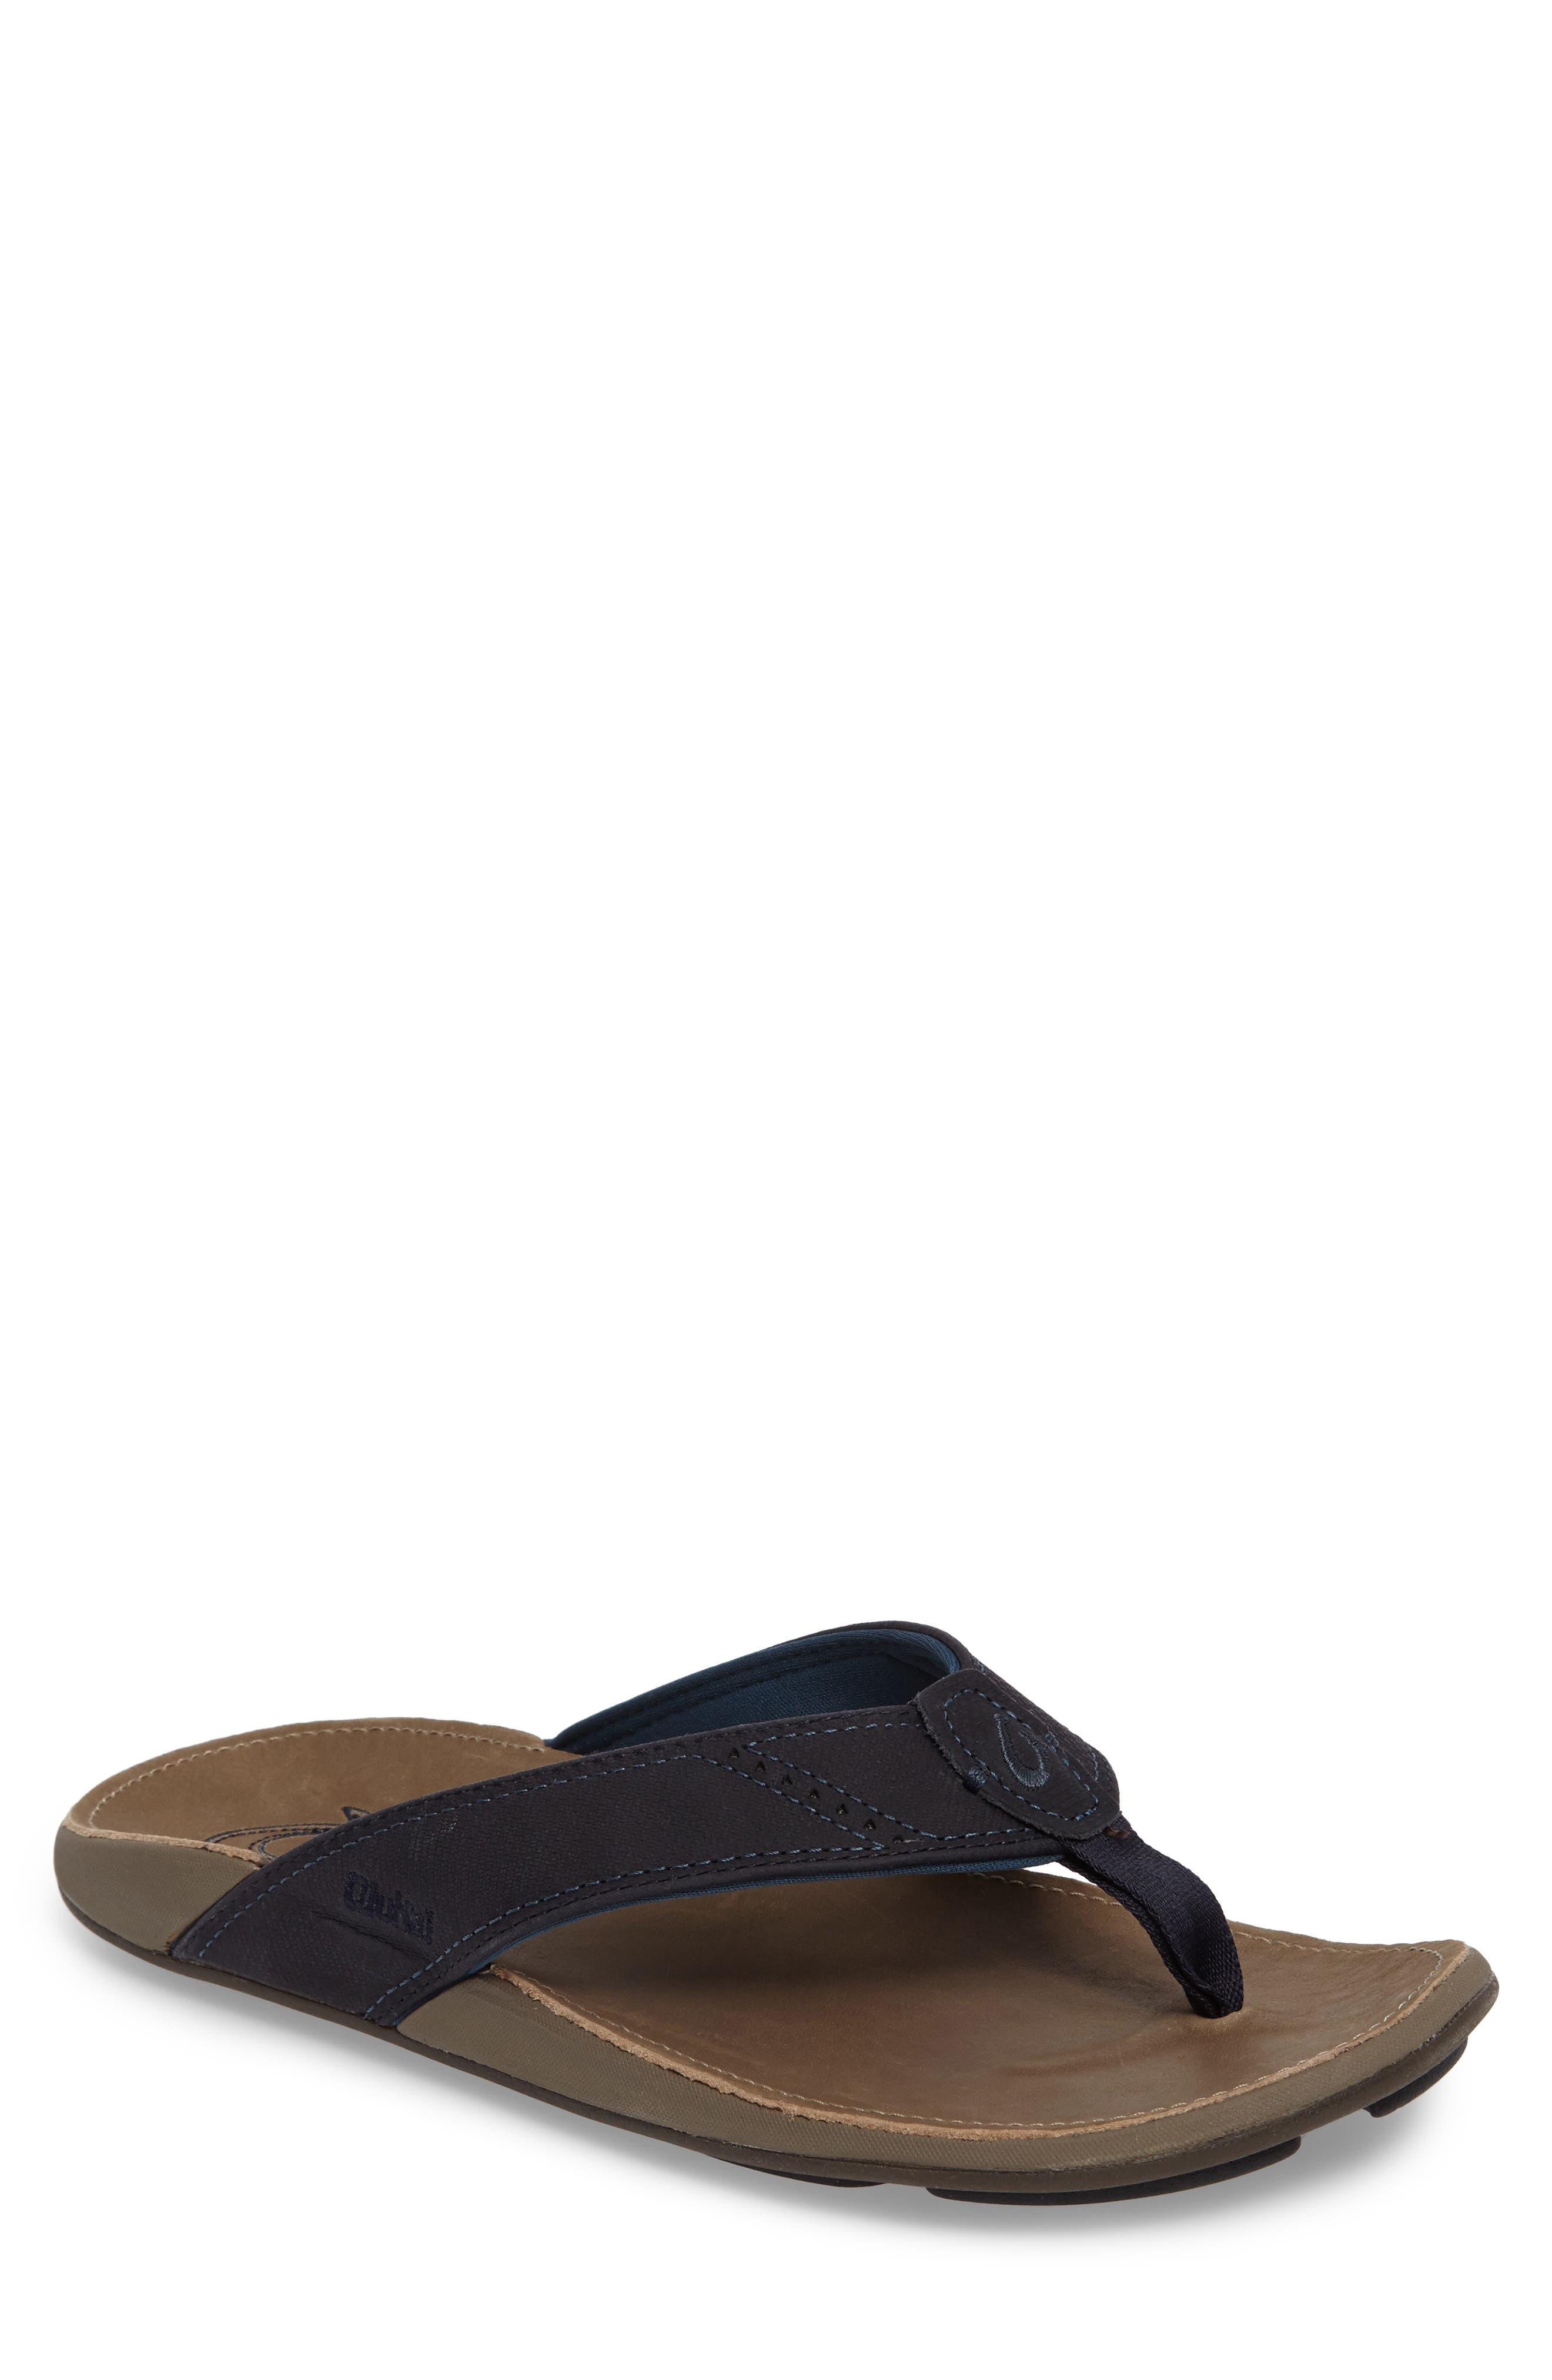 Main Image - OluKai 'Nui' Leather Flip Flop (Men)